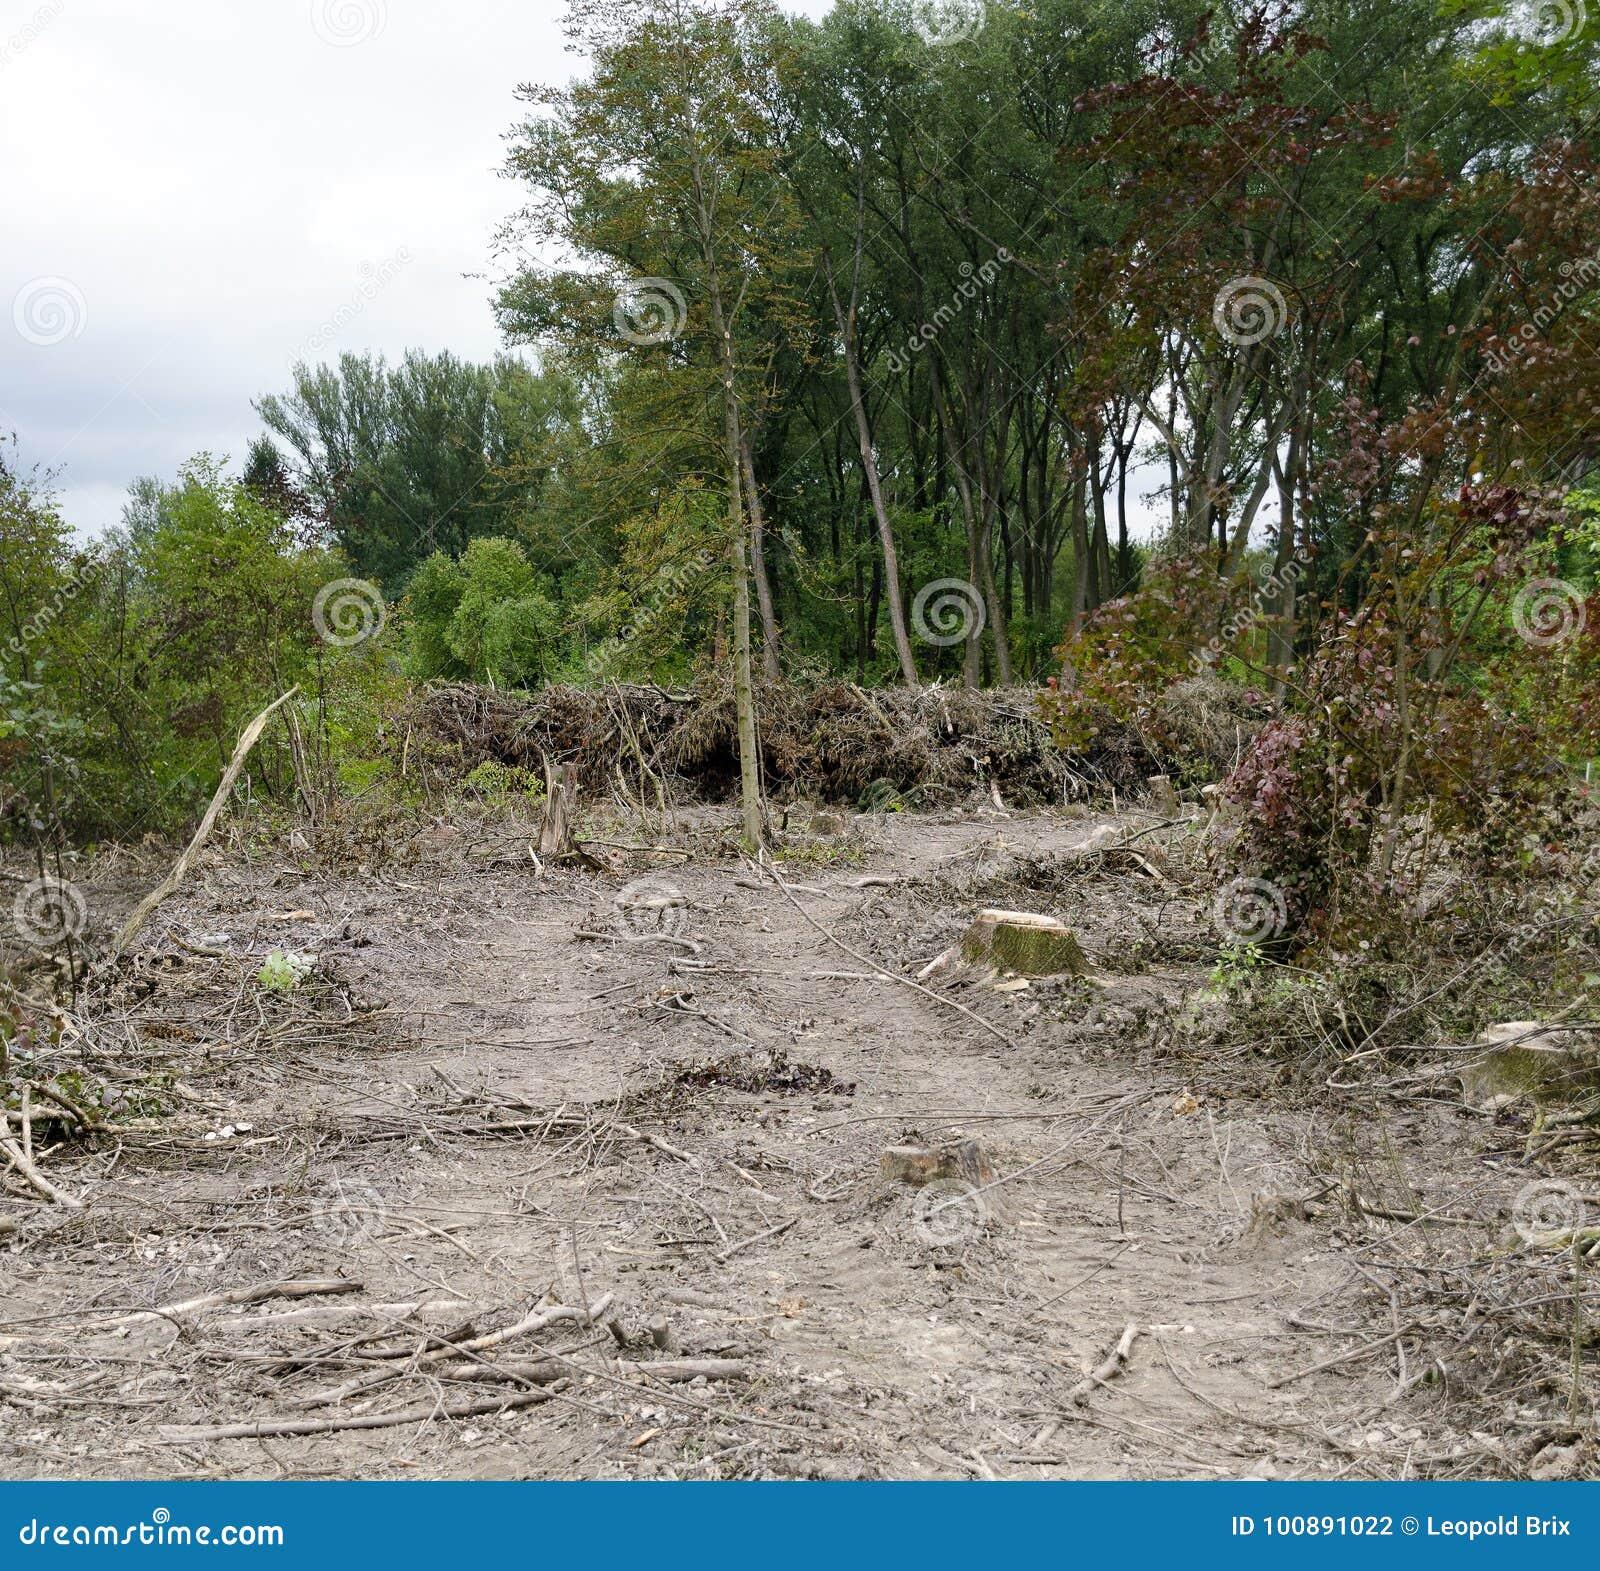 Ontruimd gebied van een oeverbos